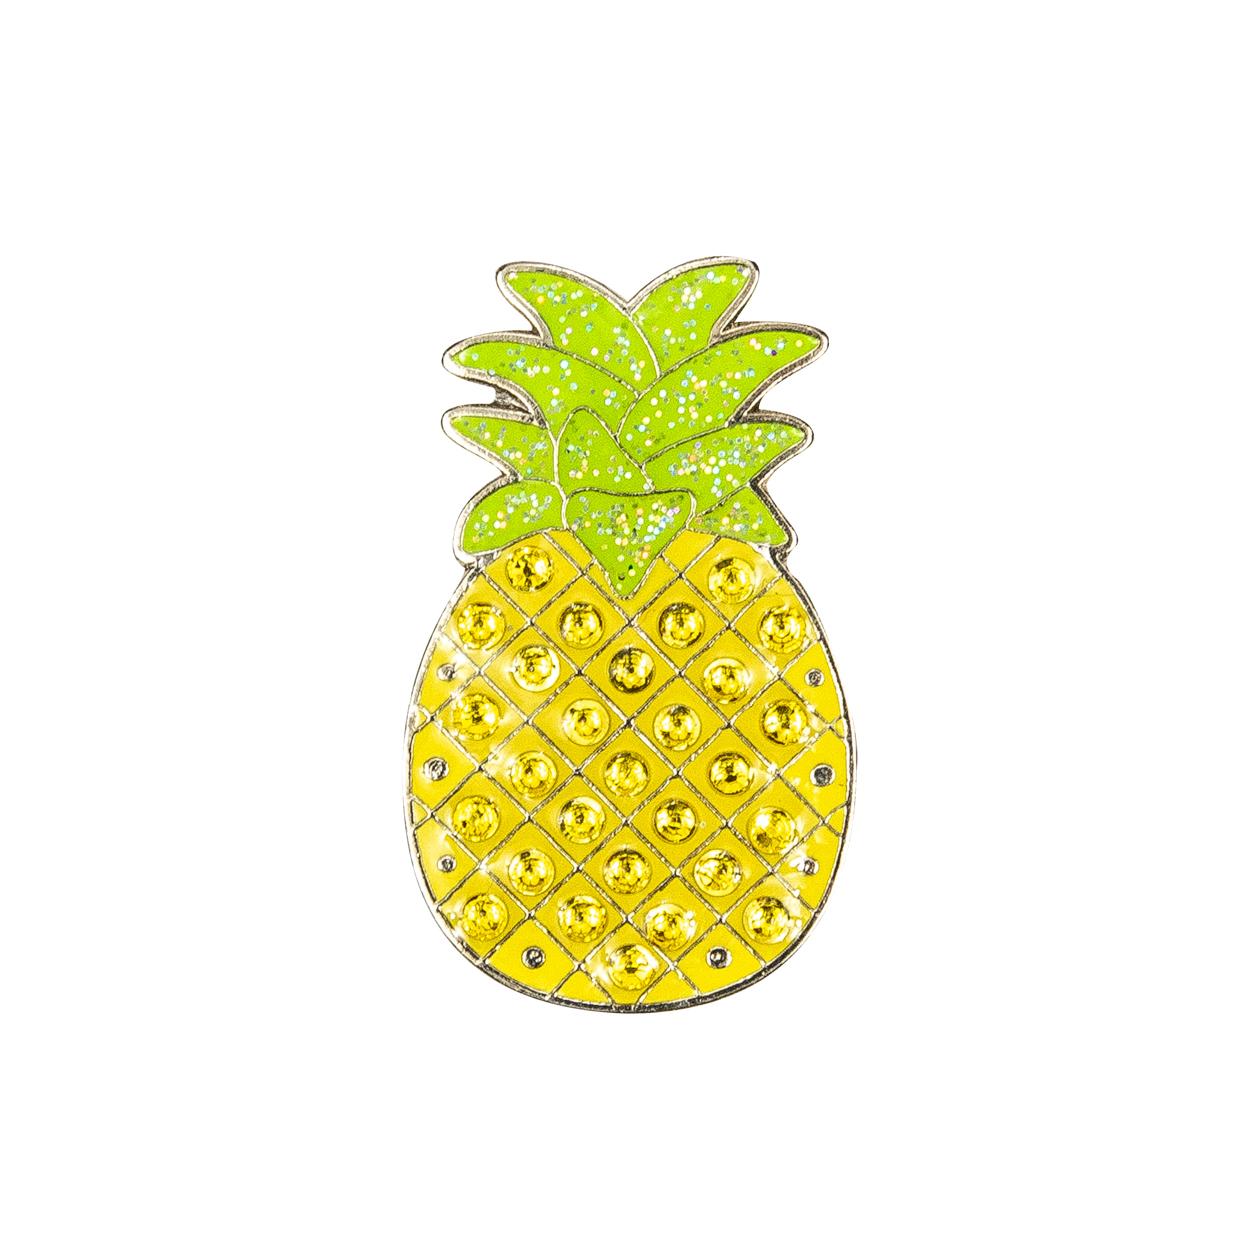 131. Pineapple